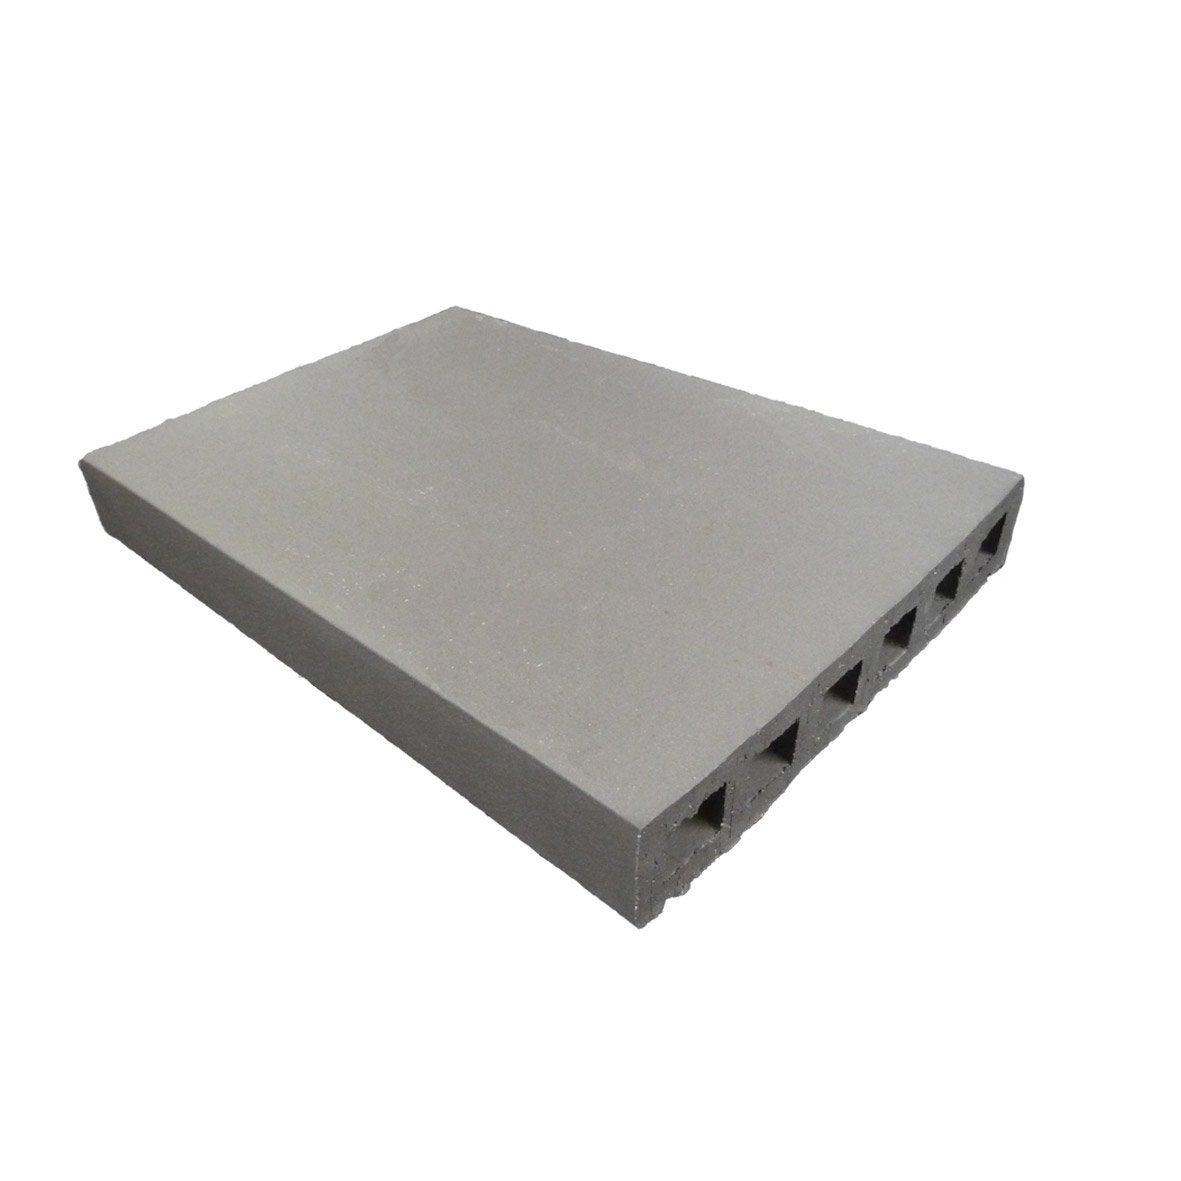 Bille Polystyrene Isolation Leroy Merlin - Novocom.top tout Bille Polystyrène Isolation Leroy Merlin